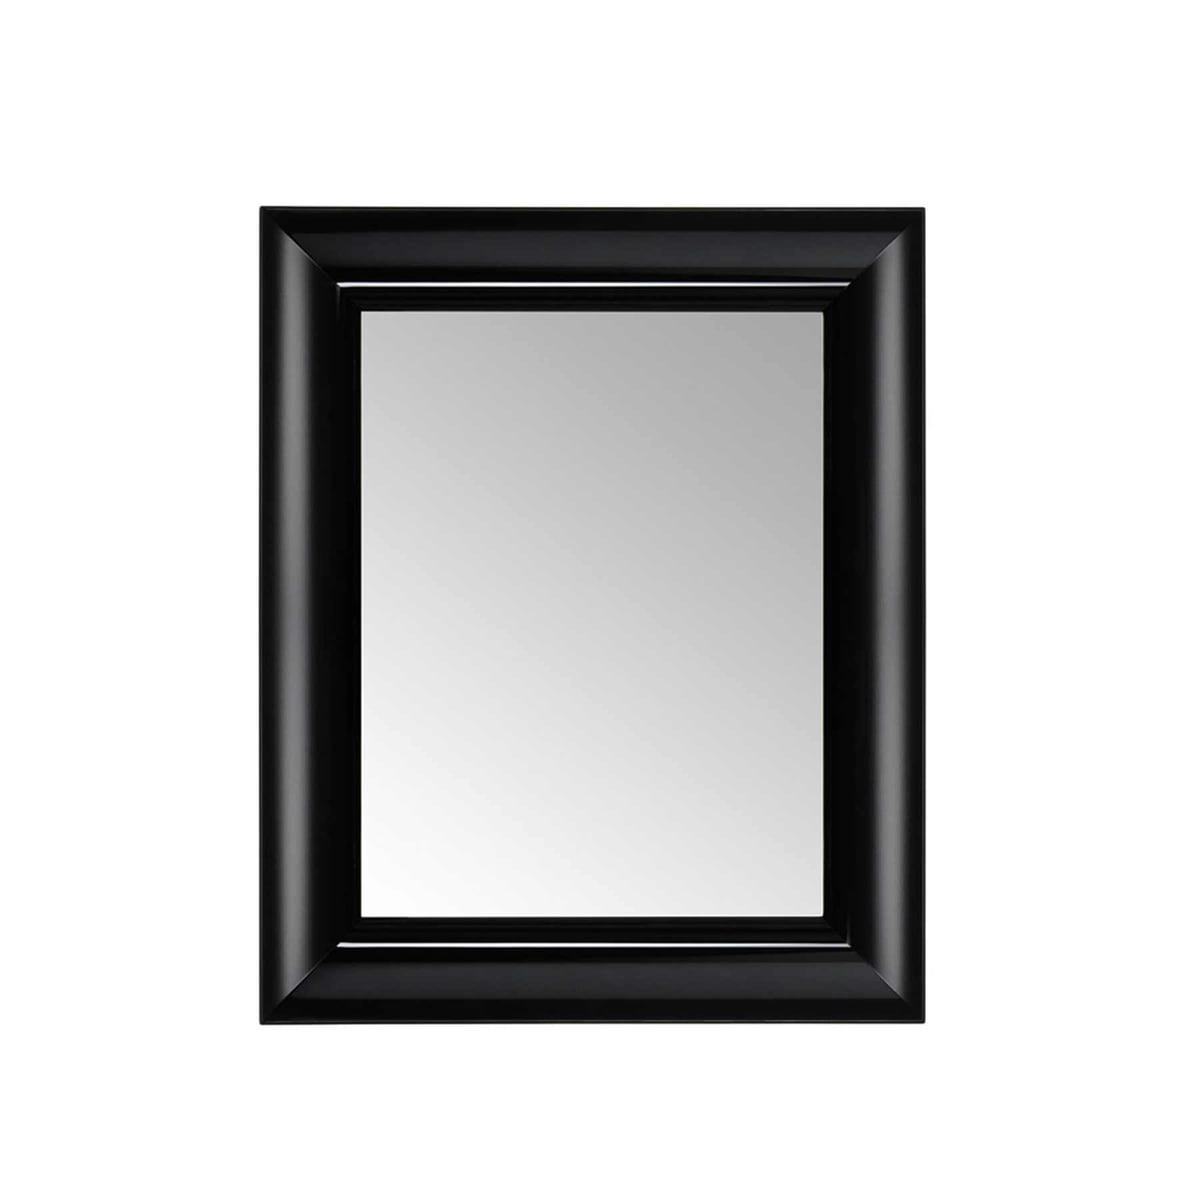 the françois ghost mirror by kartell - kartell  françois ghost mirror small black  front